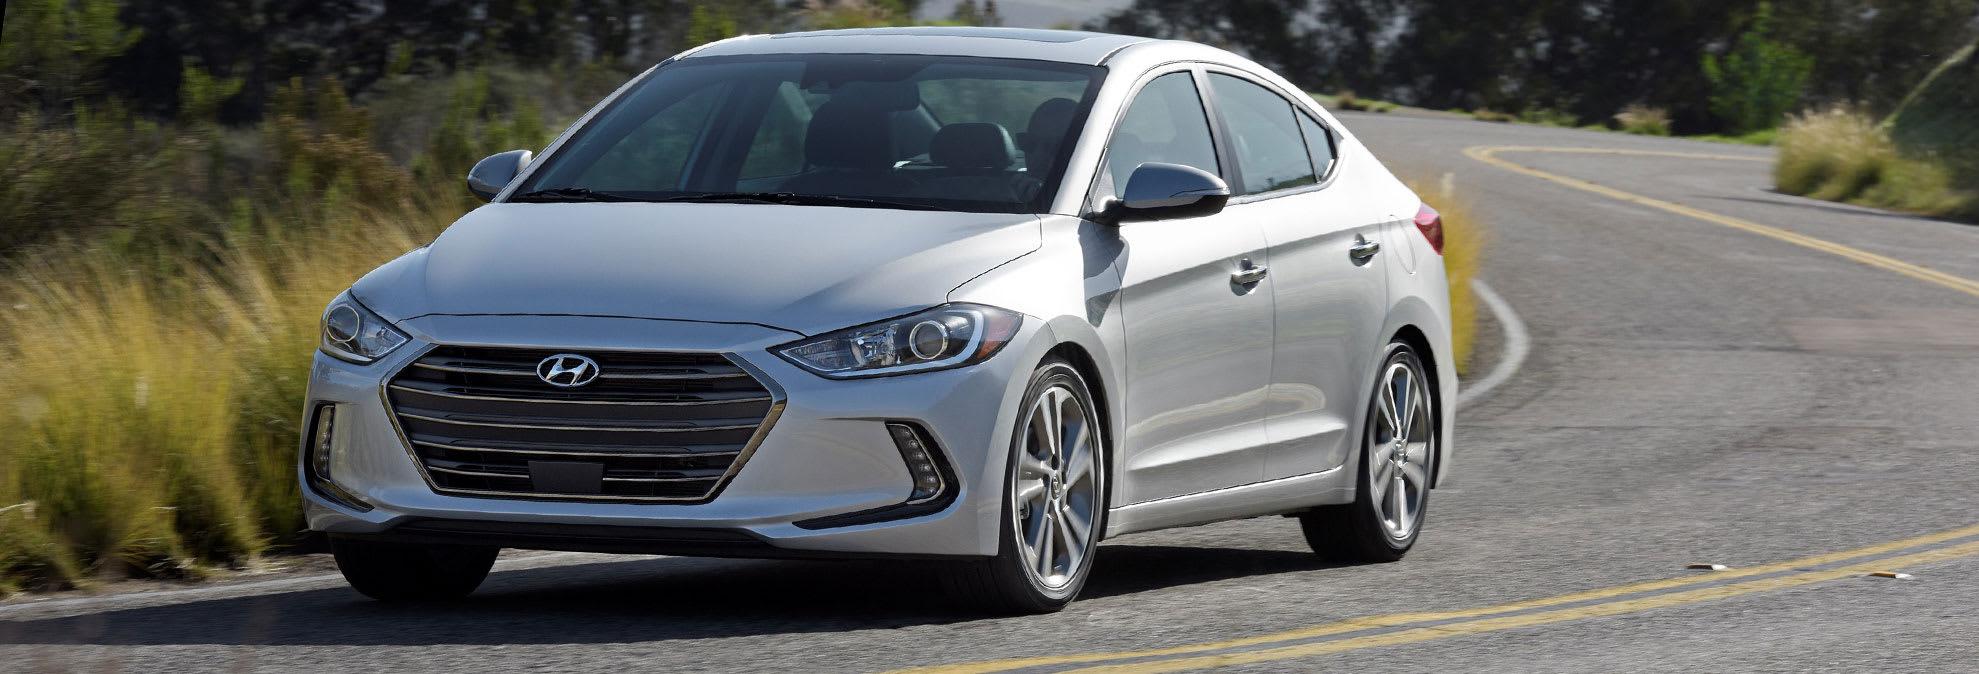 Best car purchase deals november 2018